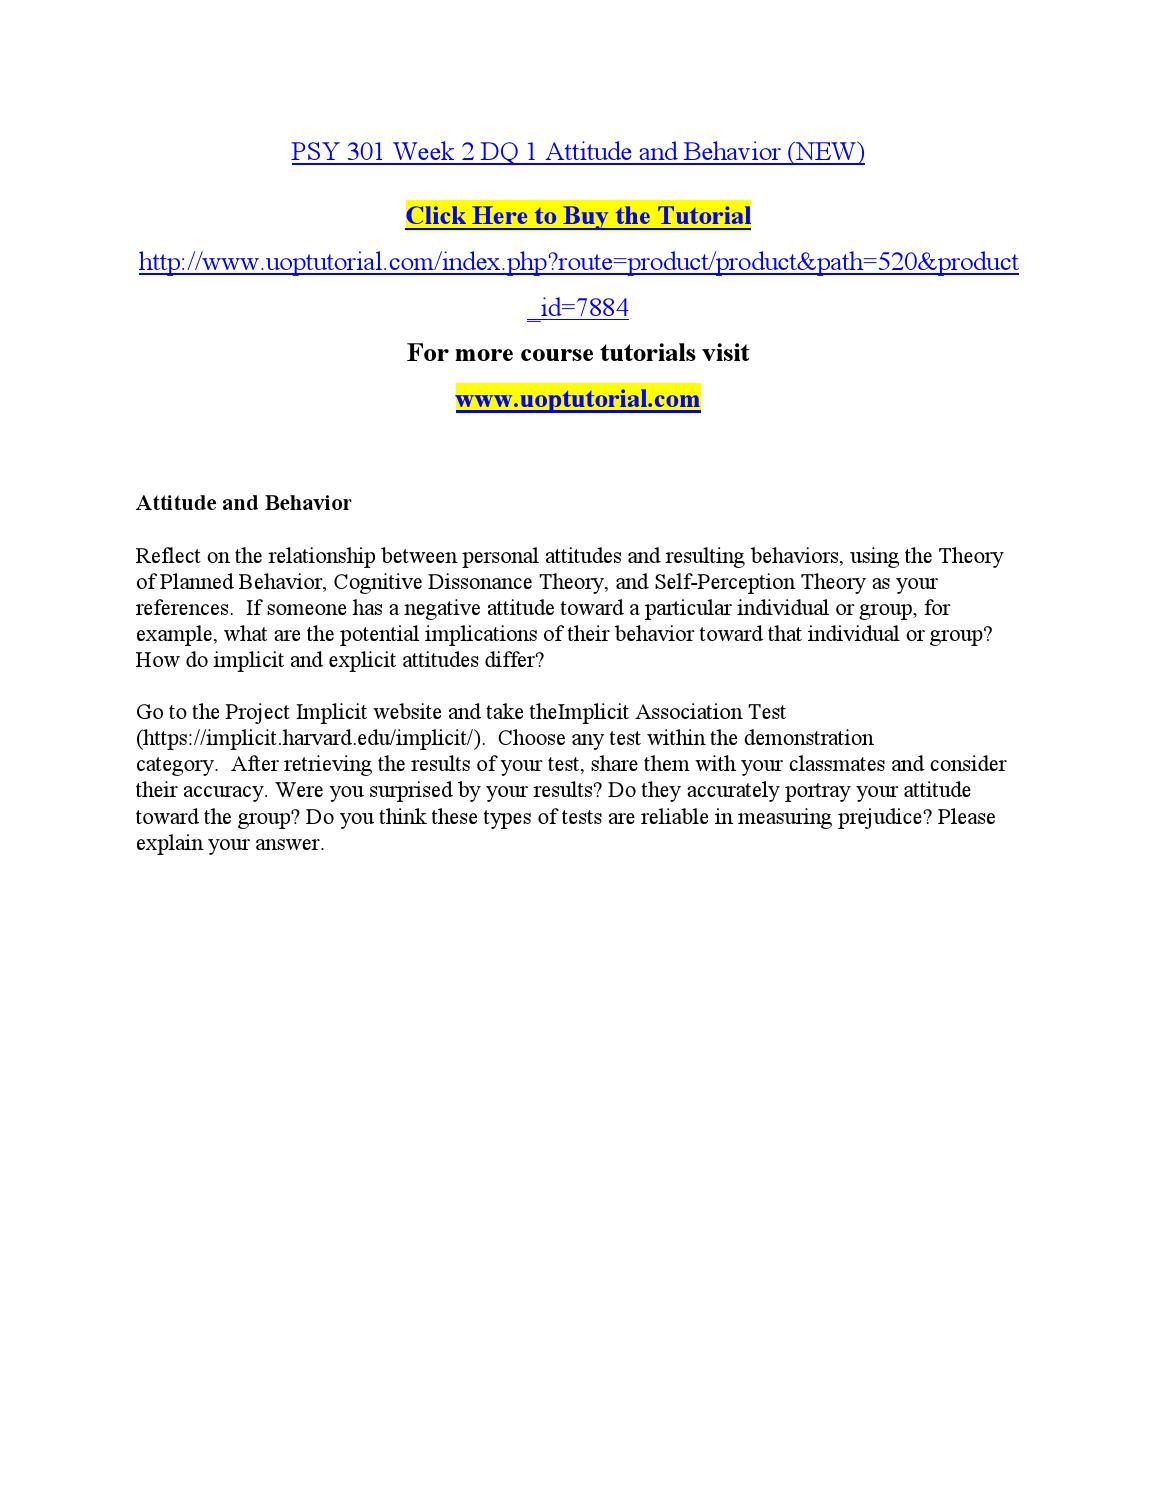 psy 301 week 2 dq 1 attitude and behavior by fgfgjhkhl issuu